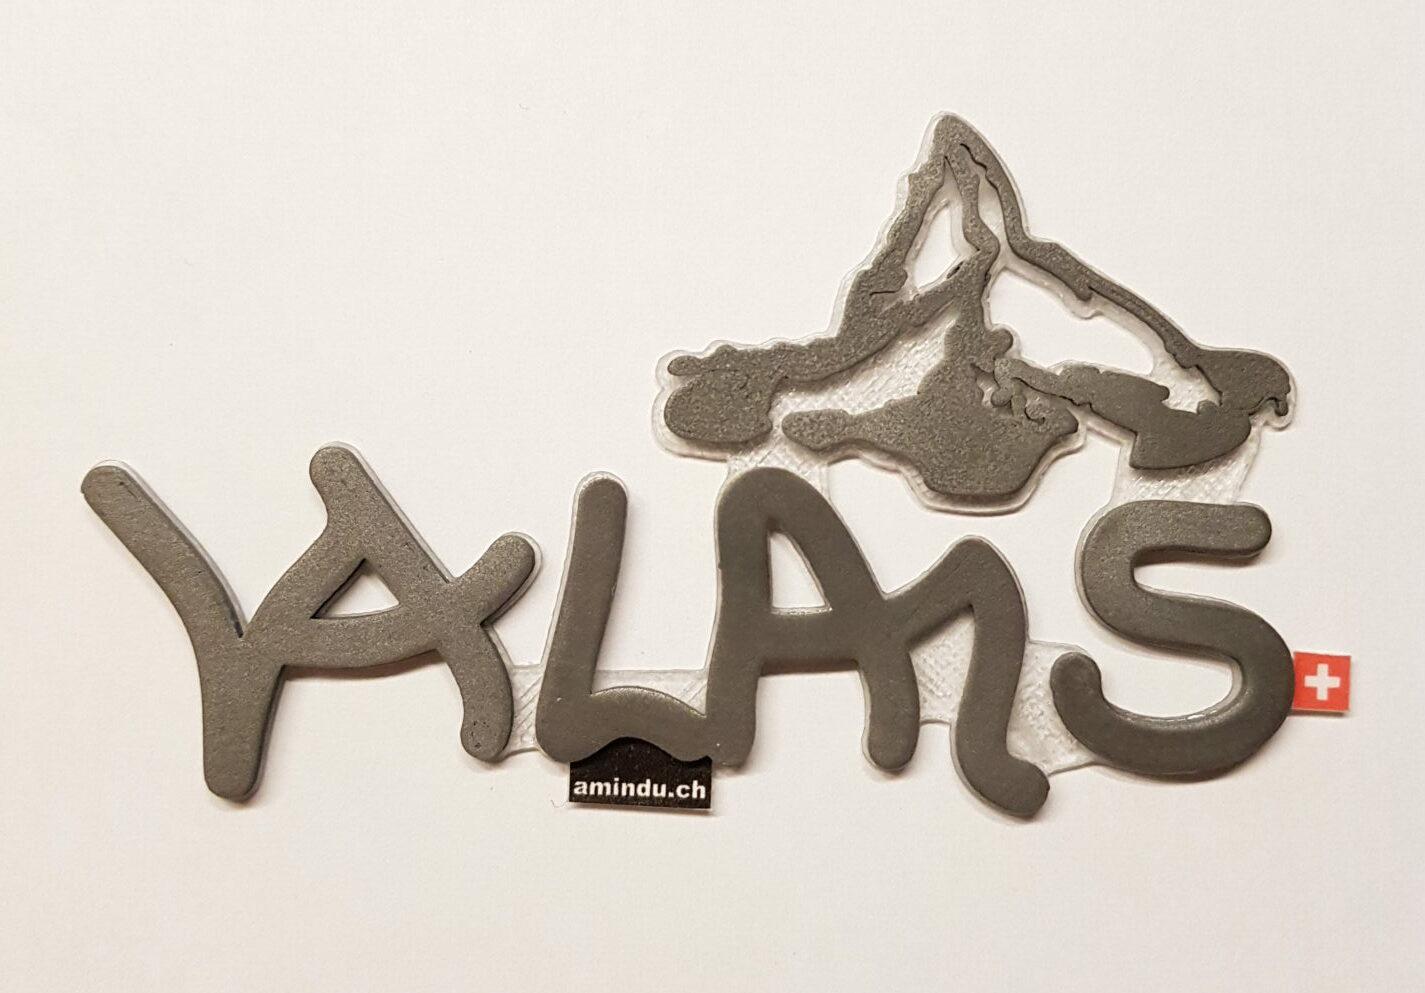 3D Aufkleber Valais Stahl